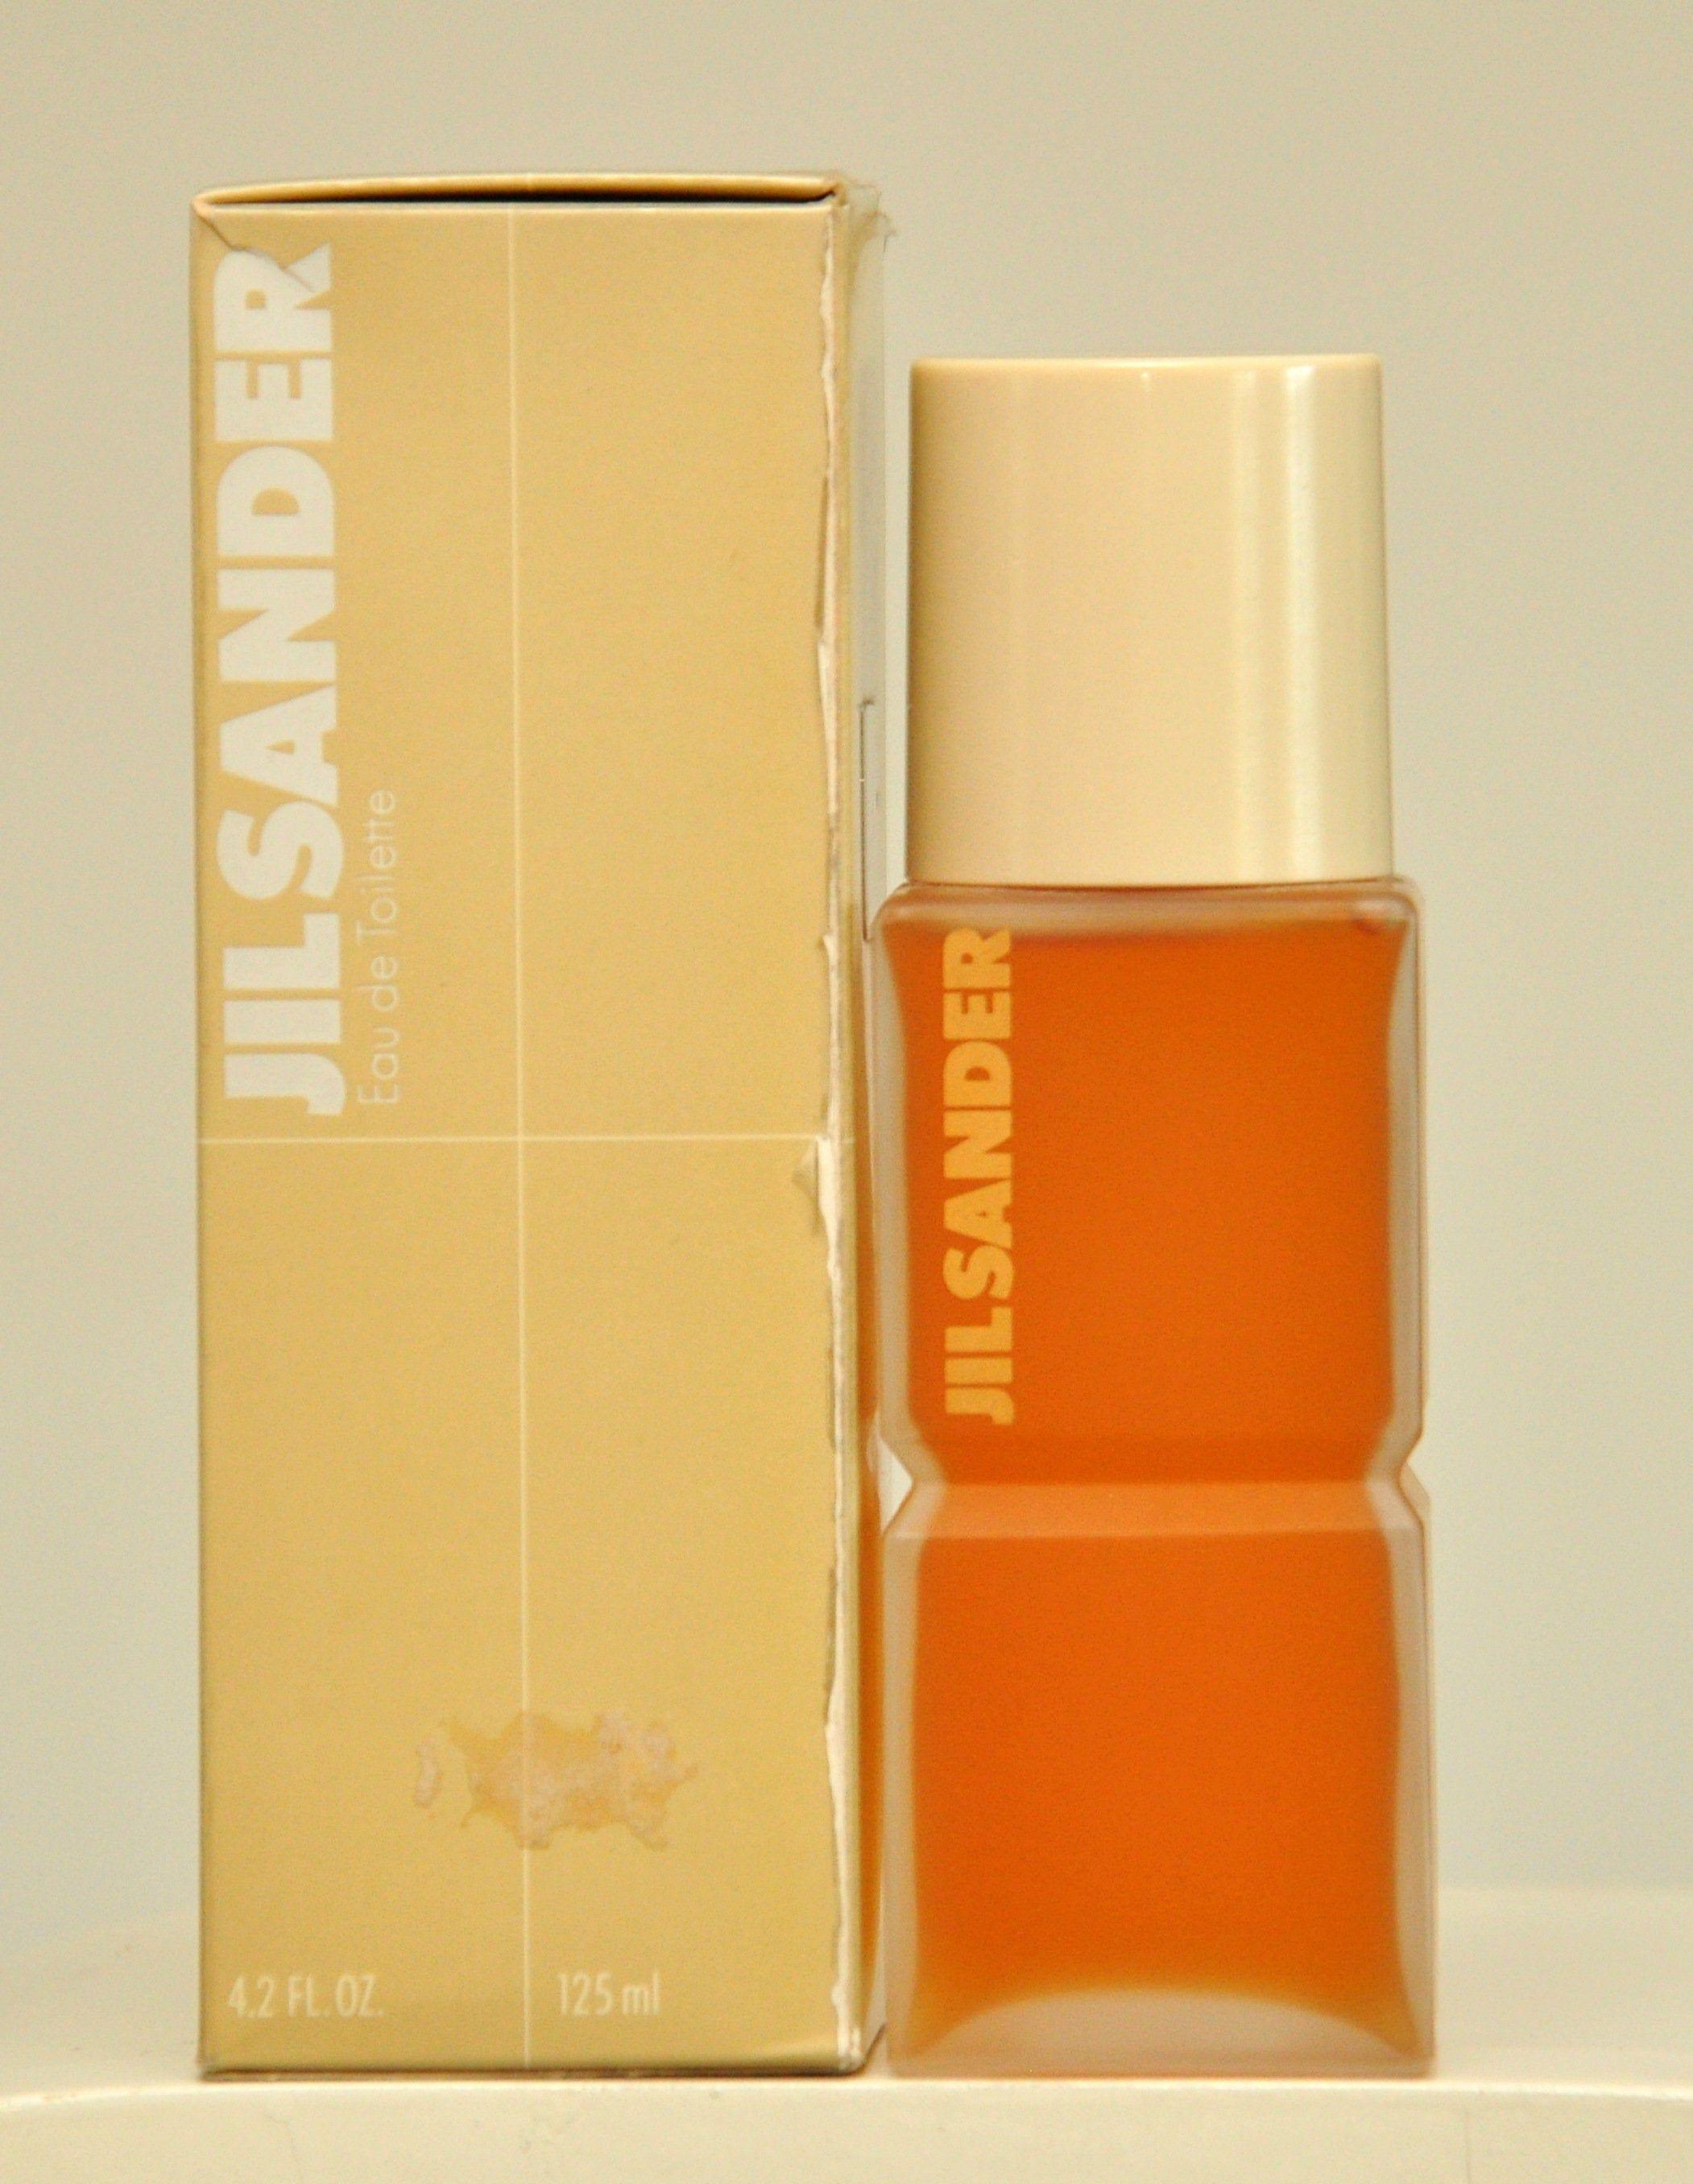 Jil Sander Woman I Woman Pure Eau De Toilette Edt 125ml 4 2 Etsy Perfume Spray Perfume Pure Products